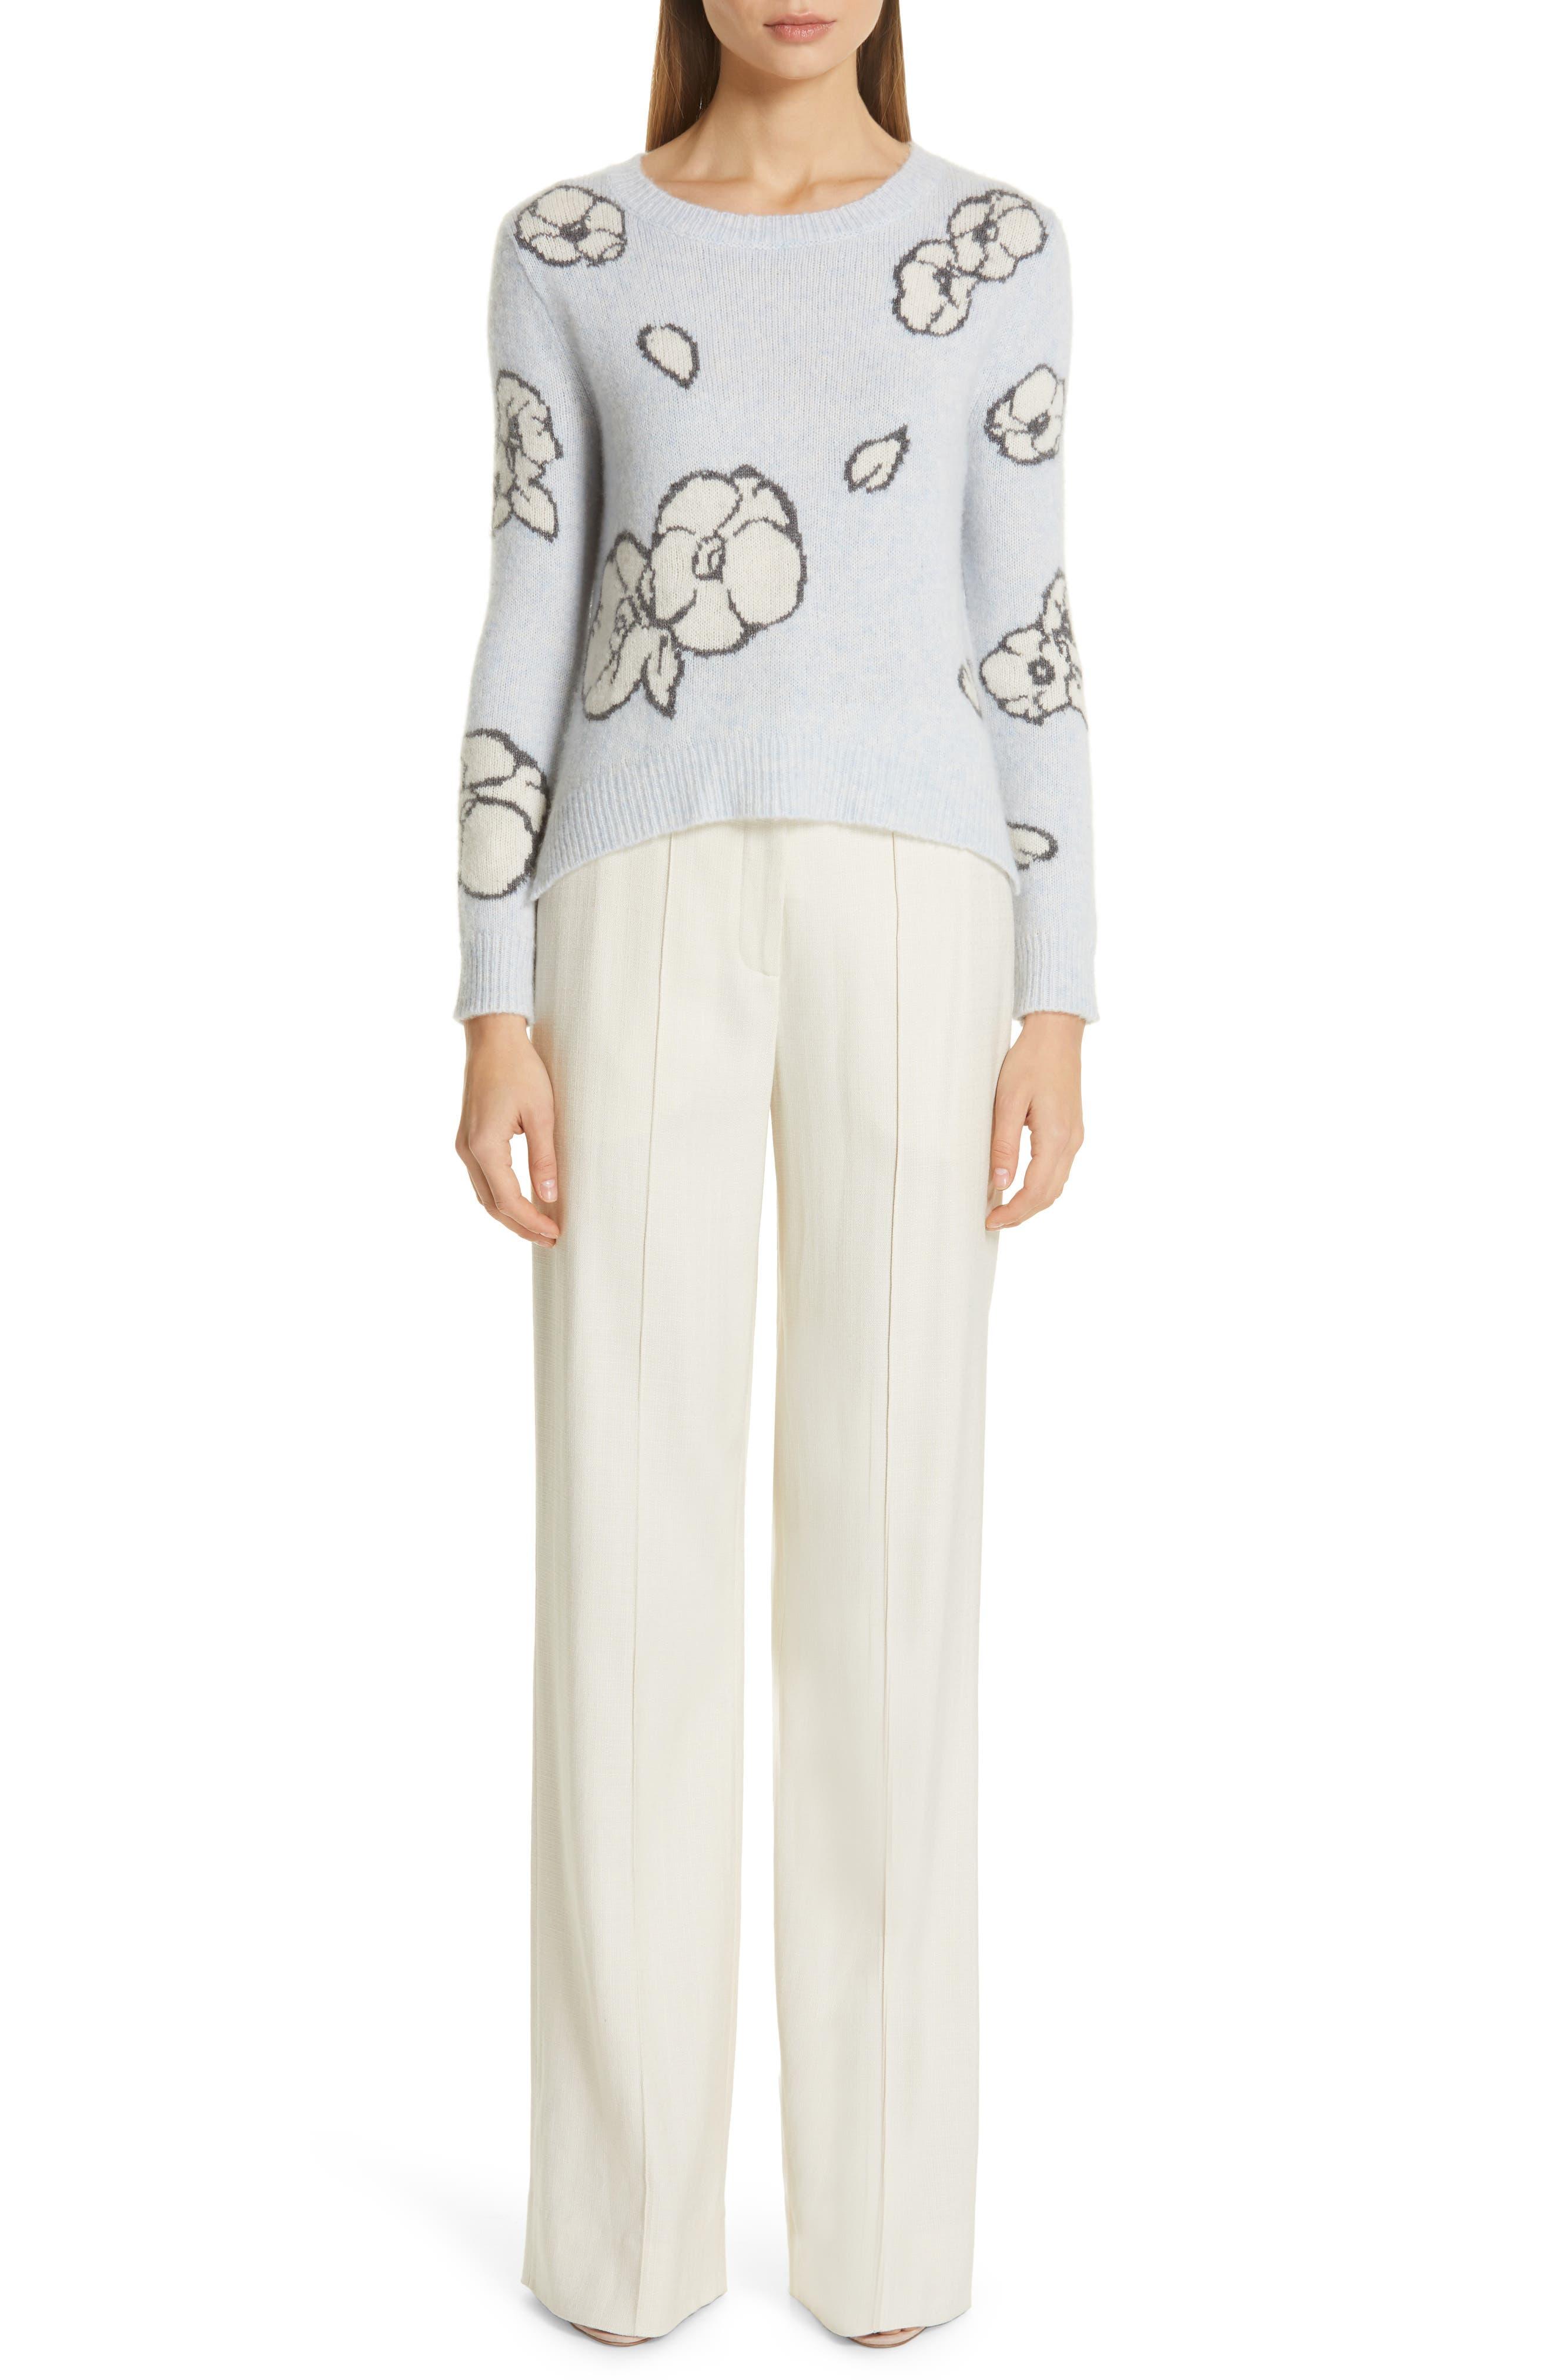 Intarsia Brushed Cashmere & Silk Sweater,                             Alternate thumbnail 8, color,                             ICE BLUE MULTI